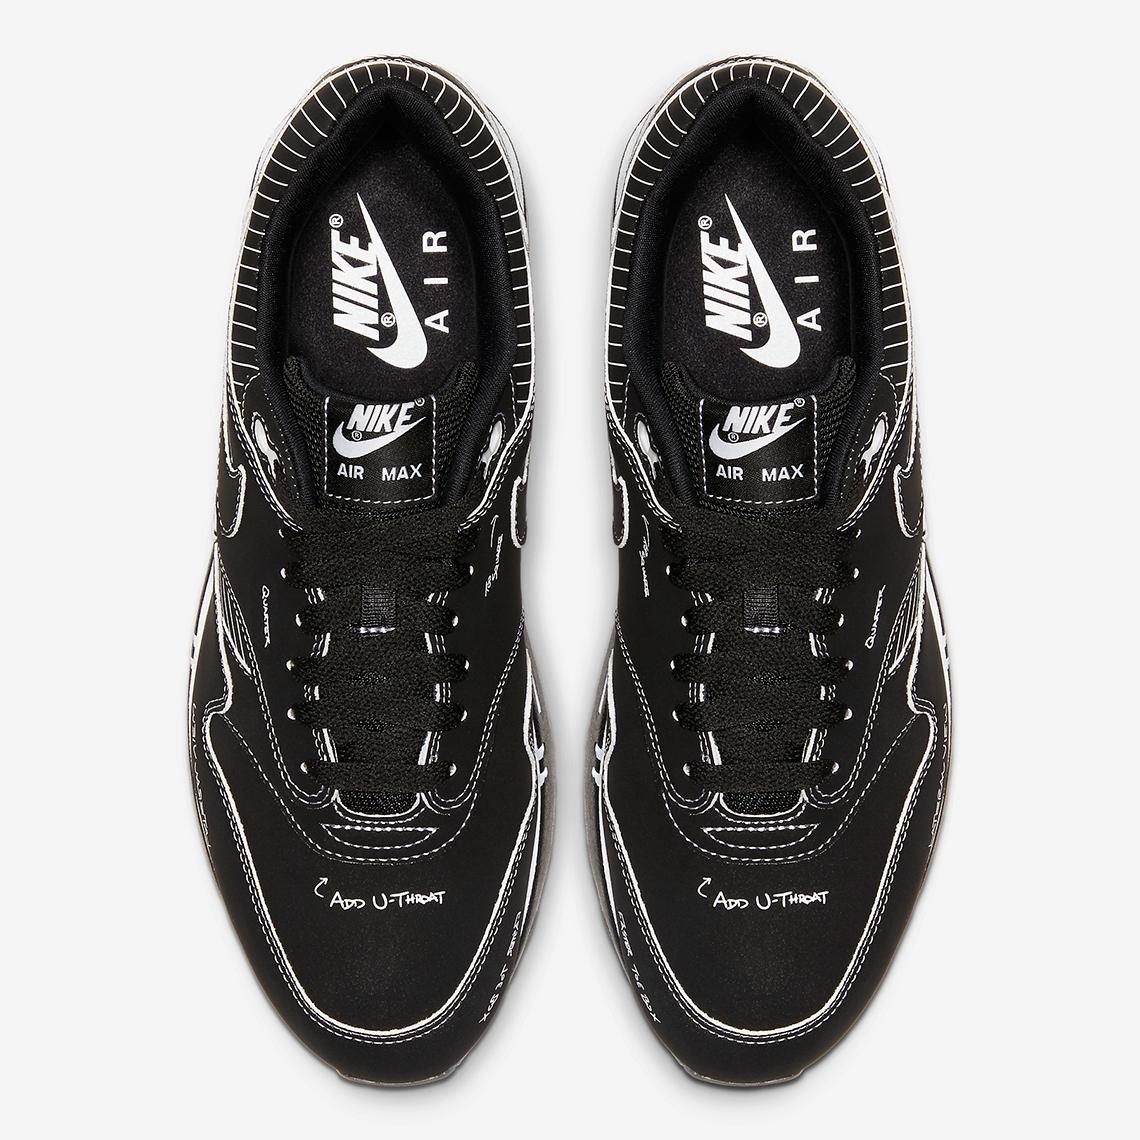 Nike Air Max 1 Tinker Hatfield Schematic Black Aug. 9, 2019